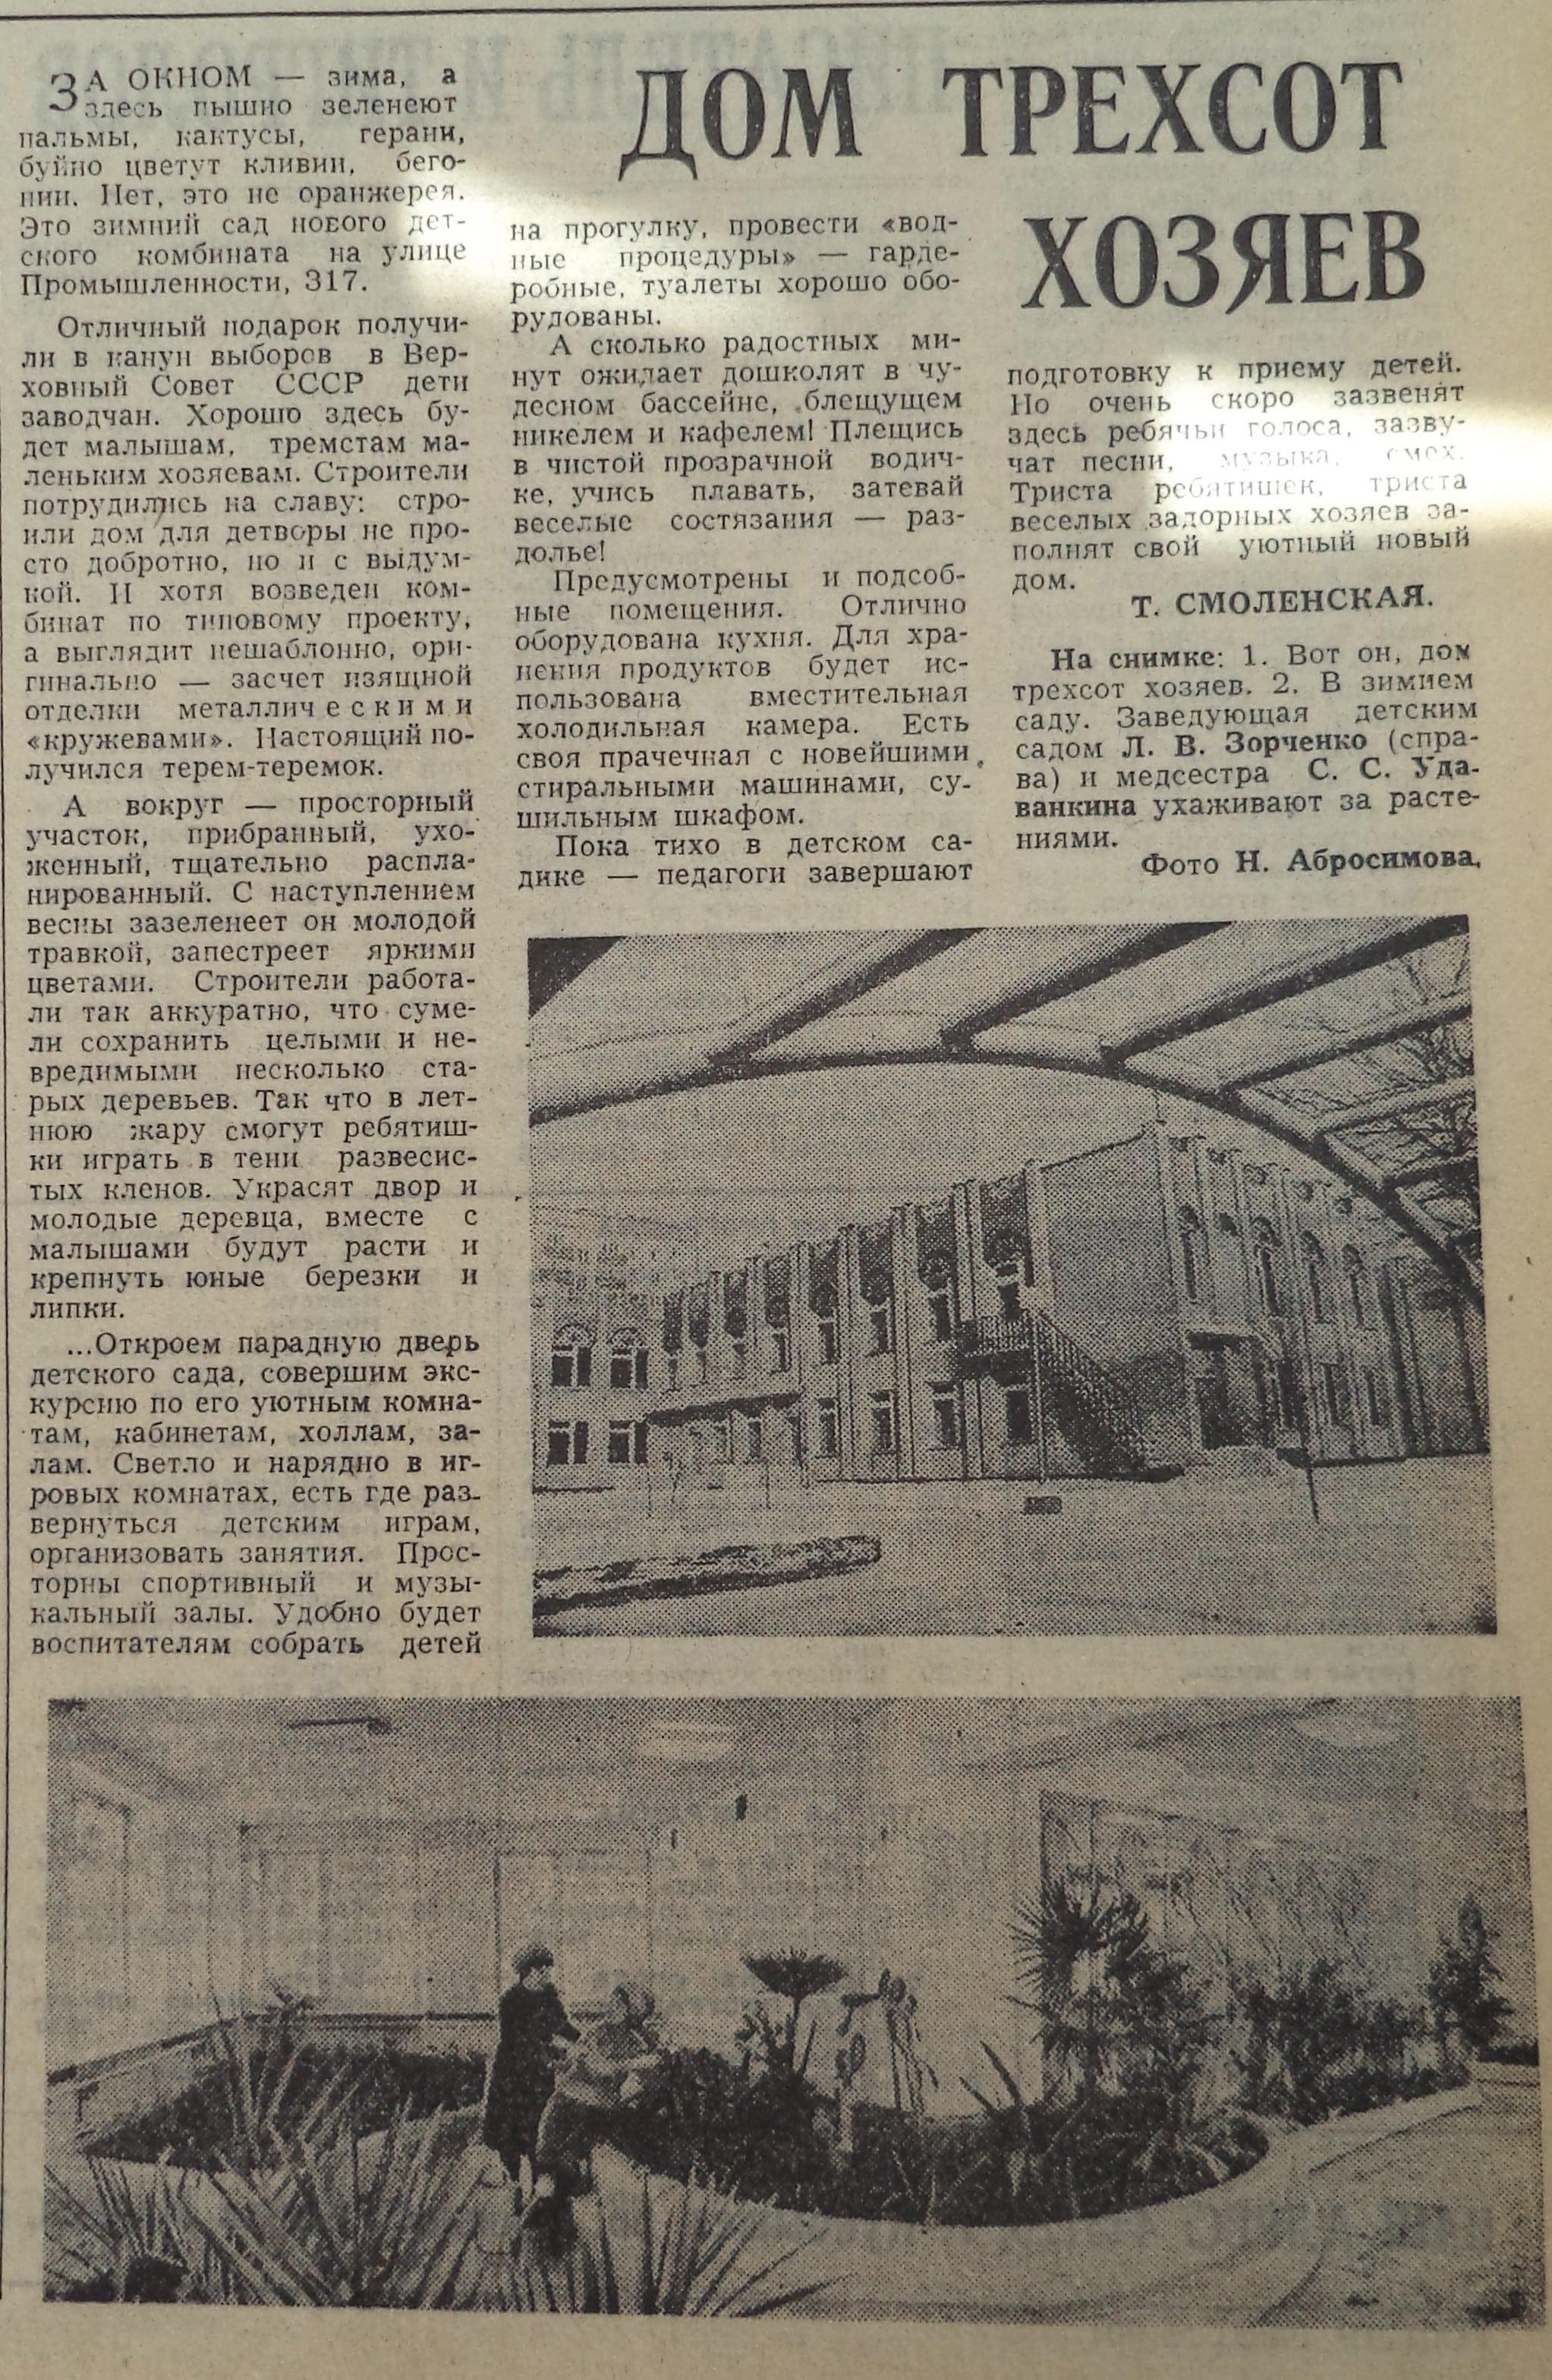 Промышленности-ФОТО-60-ВЗя-1984-02-21-про ДС на Пром.-317-min